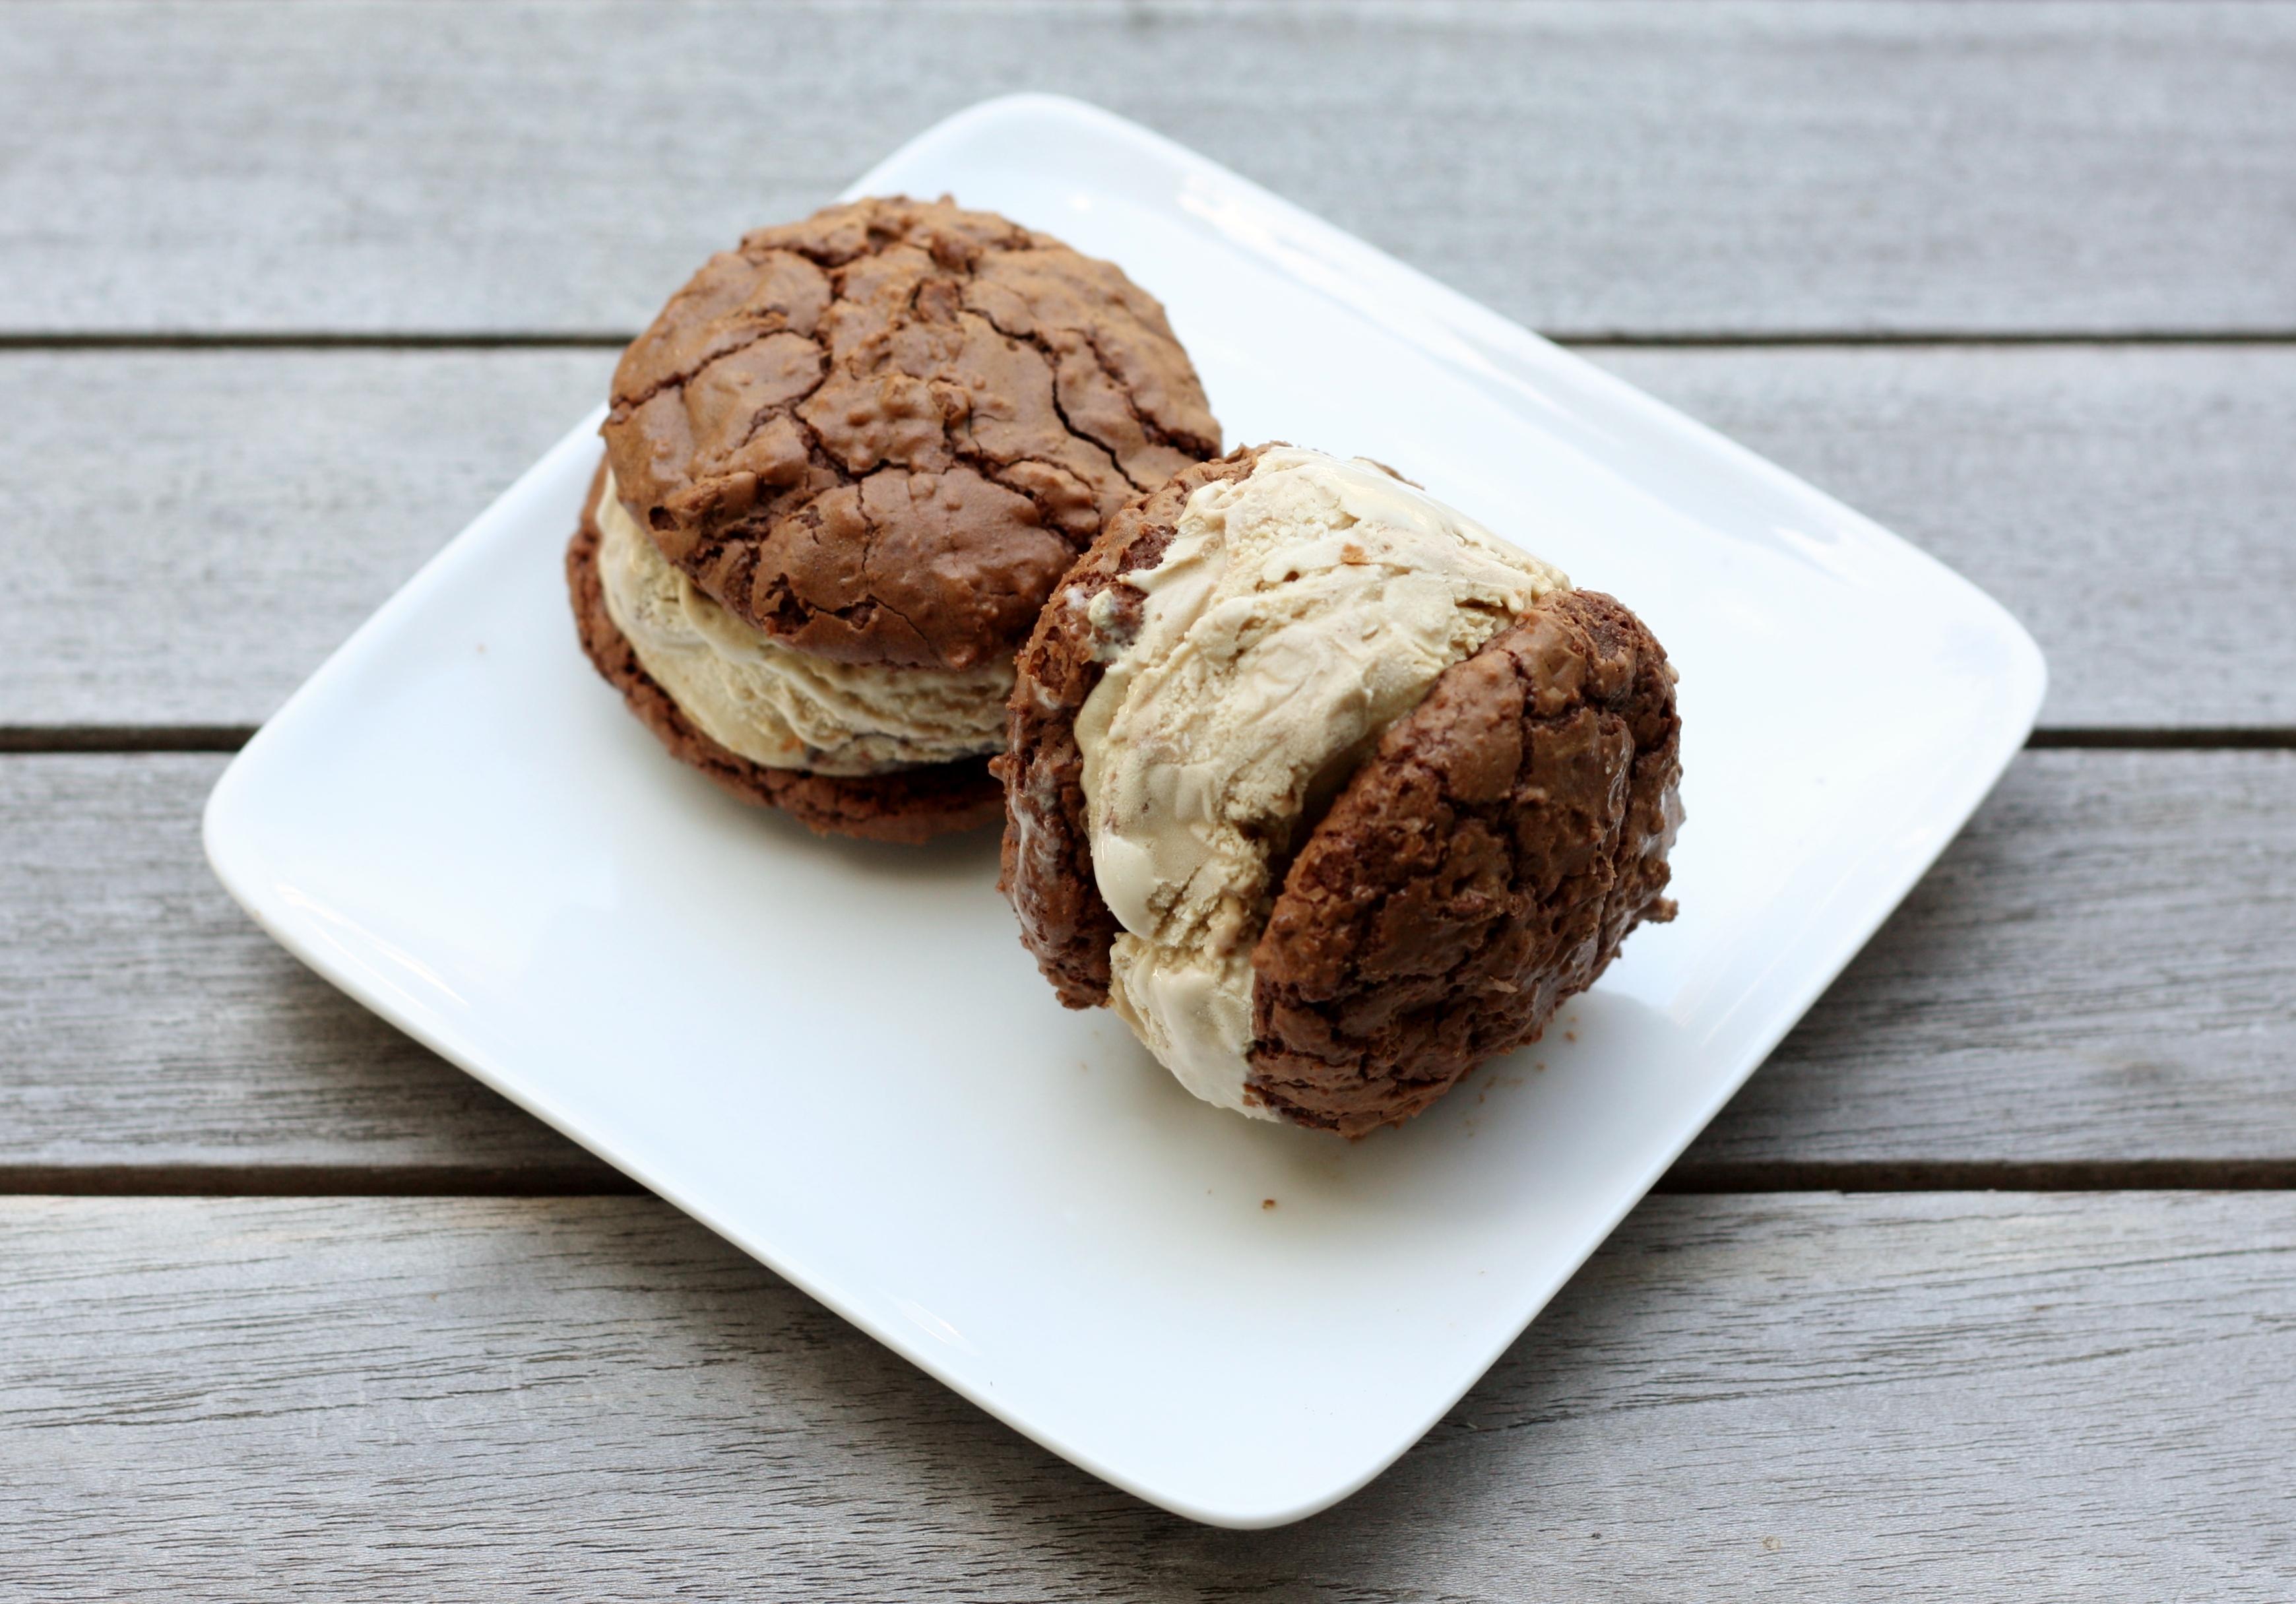 chocolate-cinnamon-and-coffee-ice-cream-sandwiches